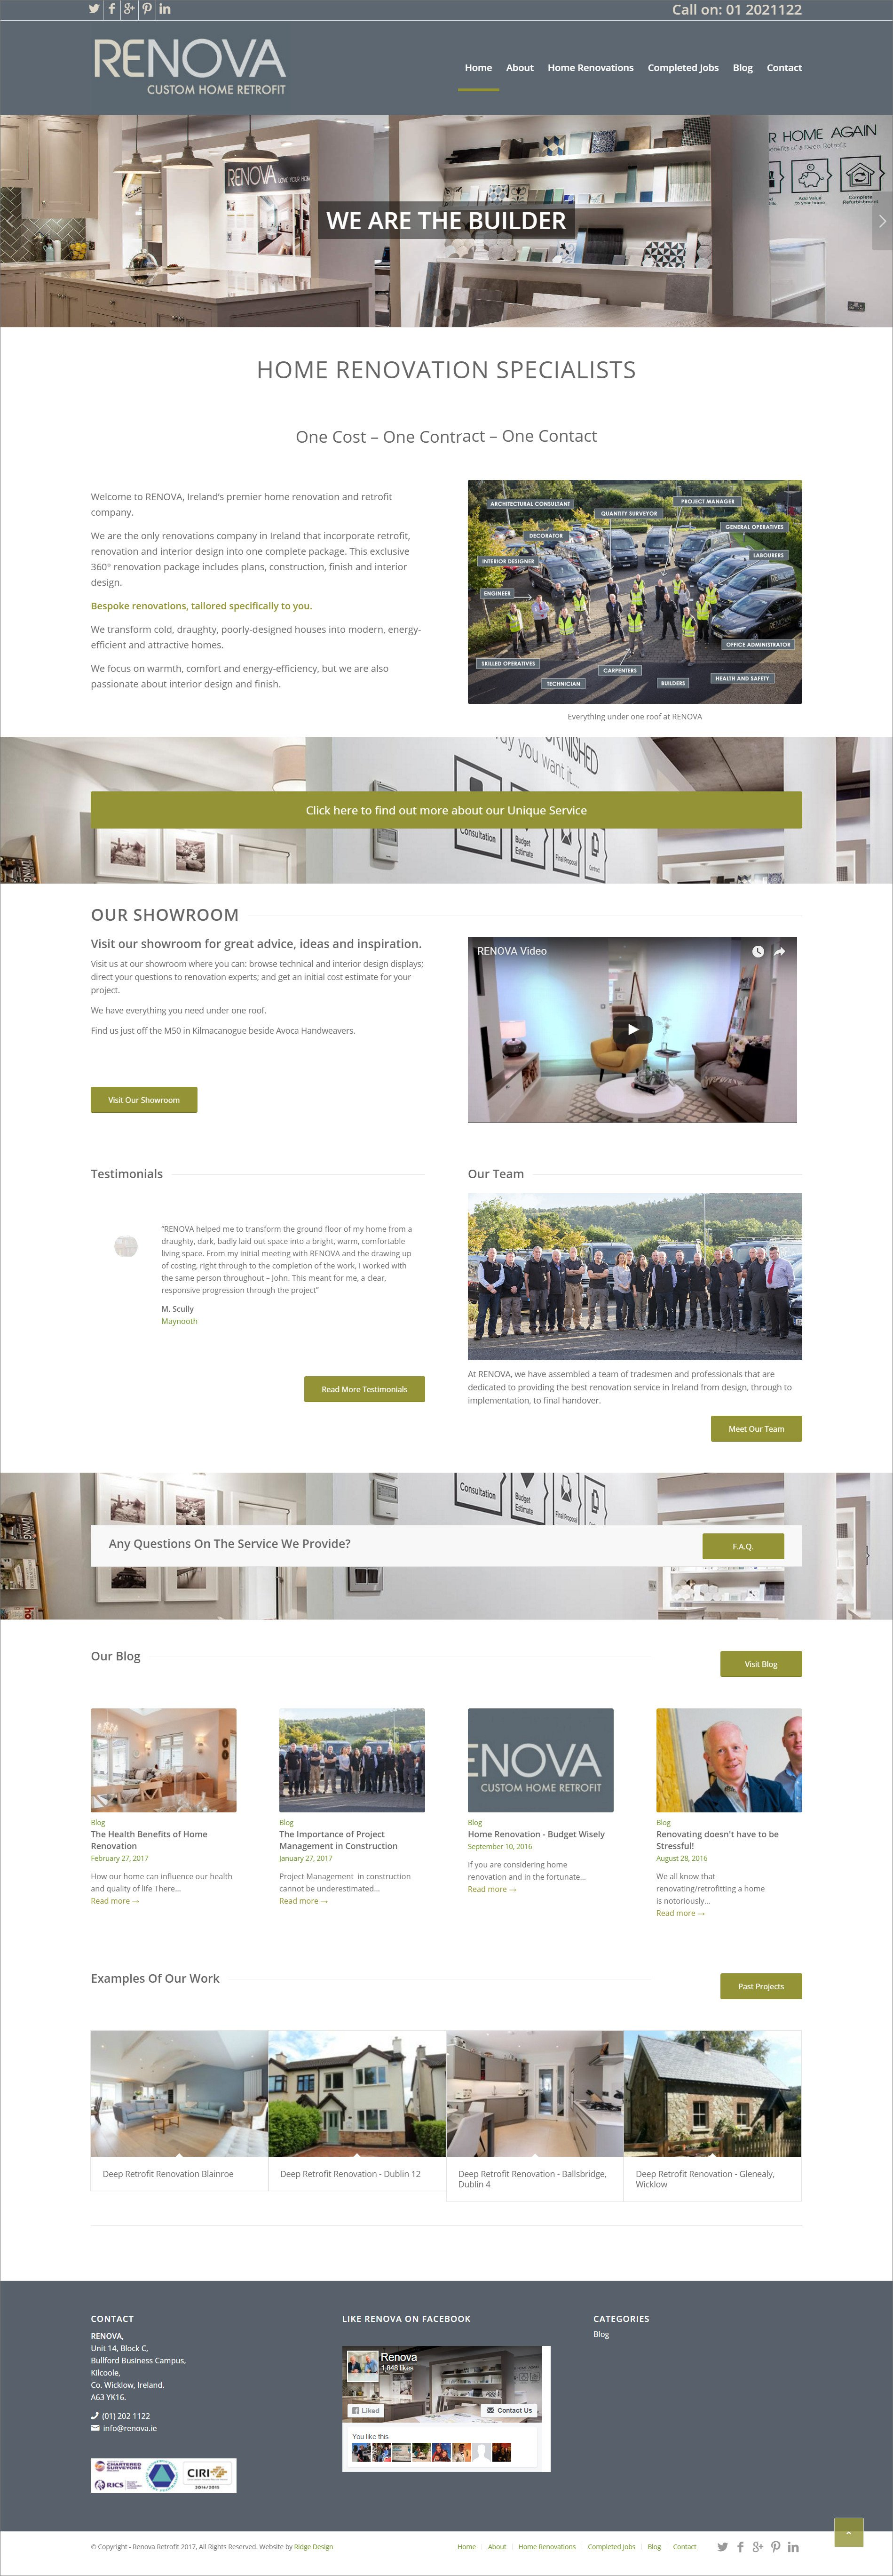 Ridge-Design-Website-Design-For-Renova-Home